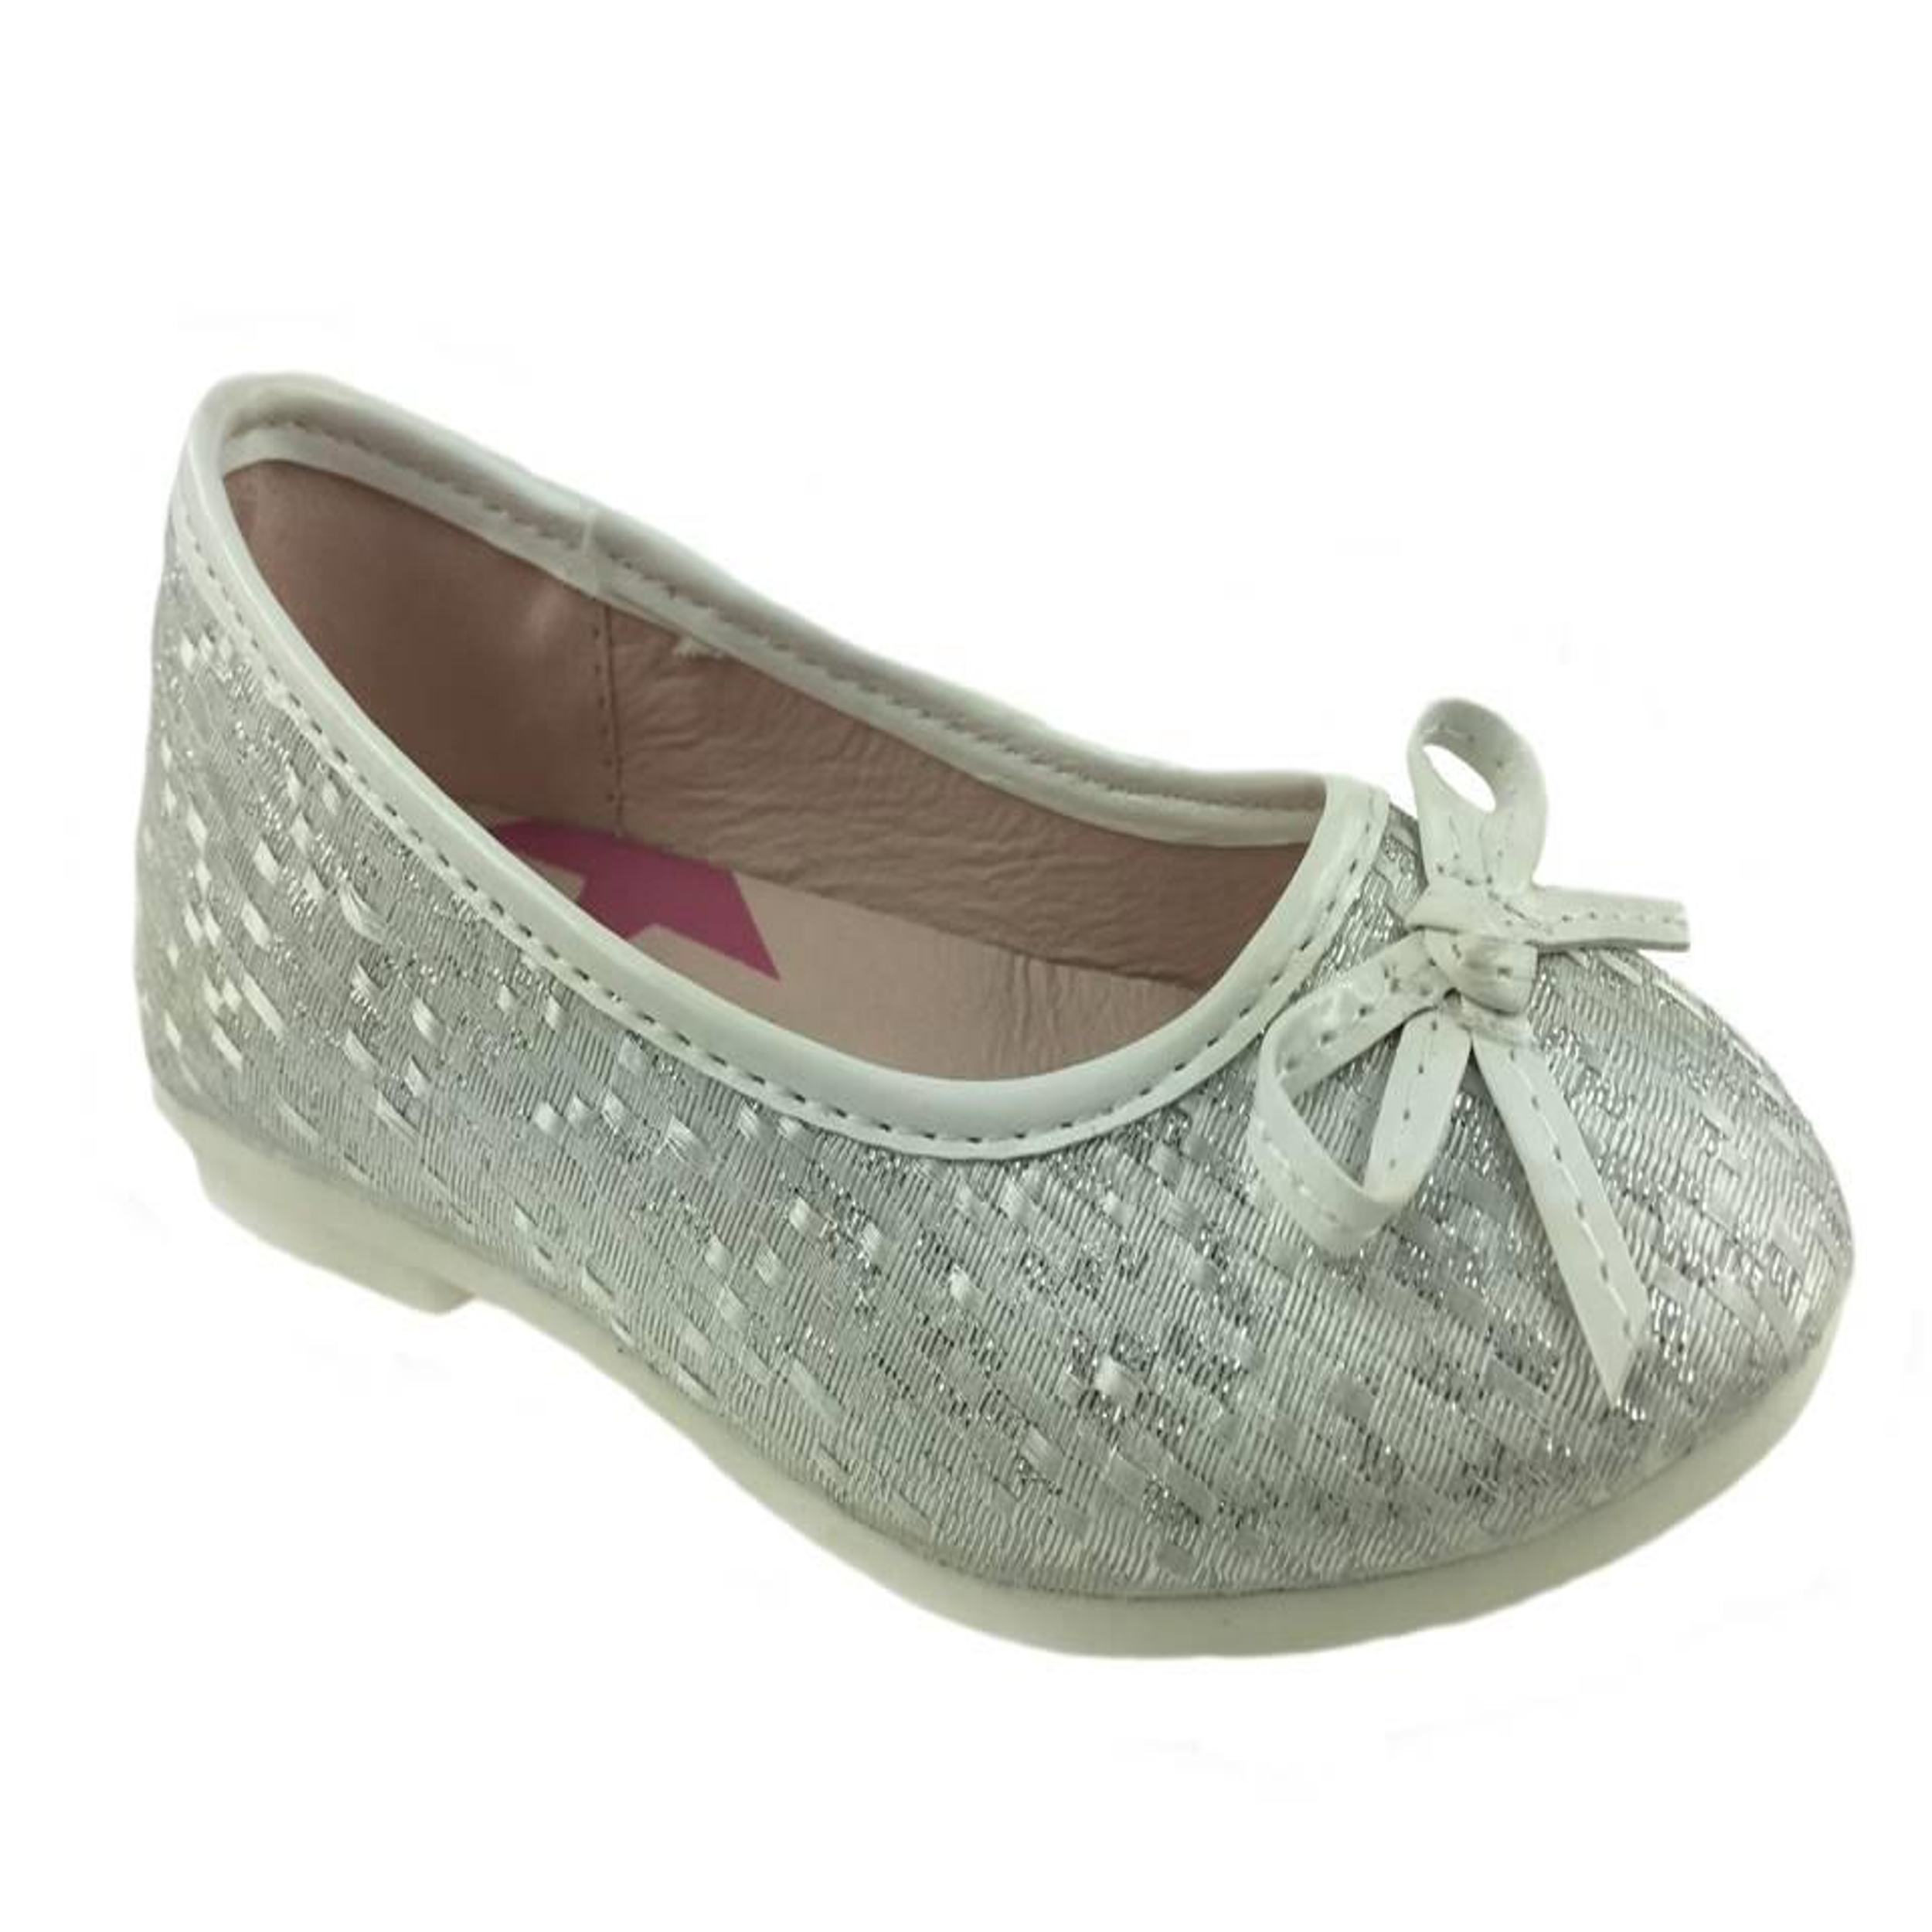 0740ed1be1b Girls Elema Glitter Ballerina Shoes UK 8.5-3 - MCFootwearLTD